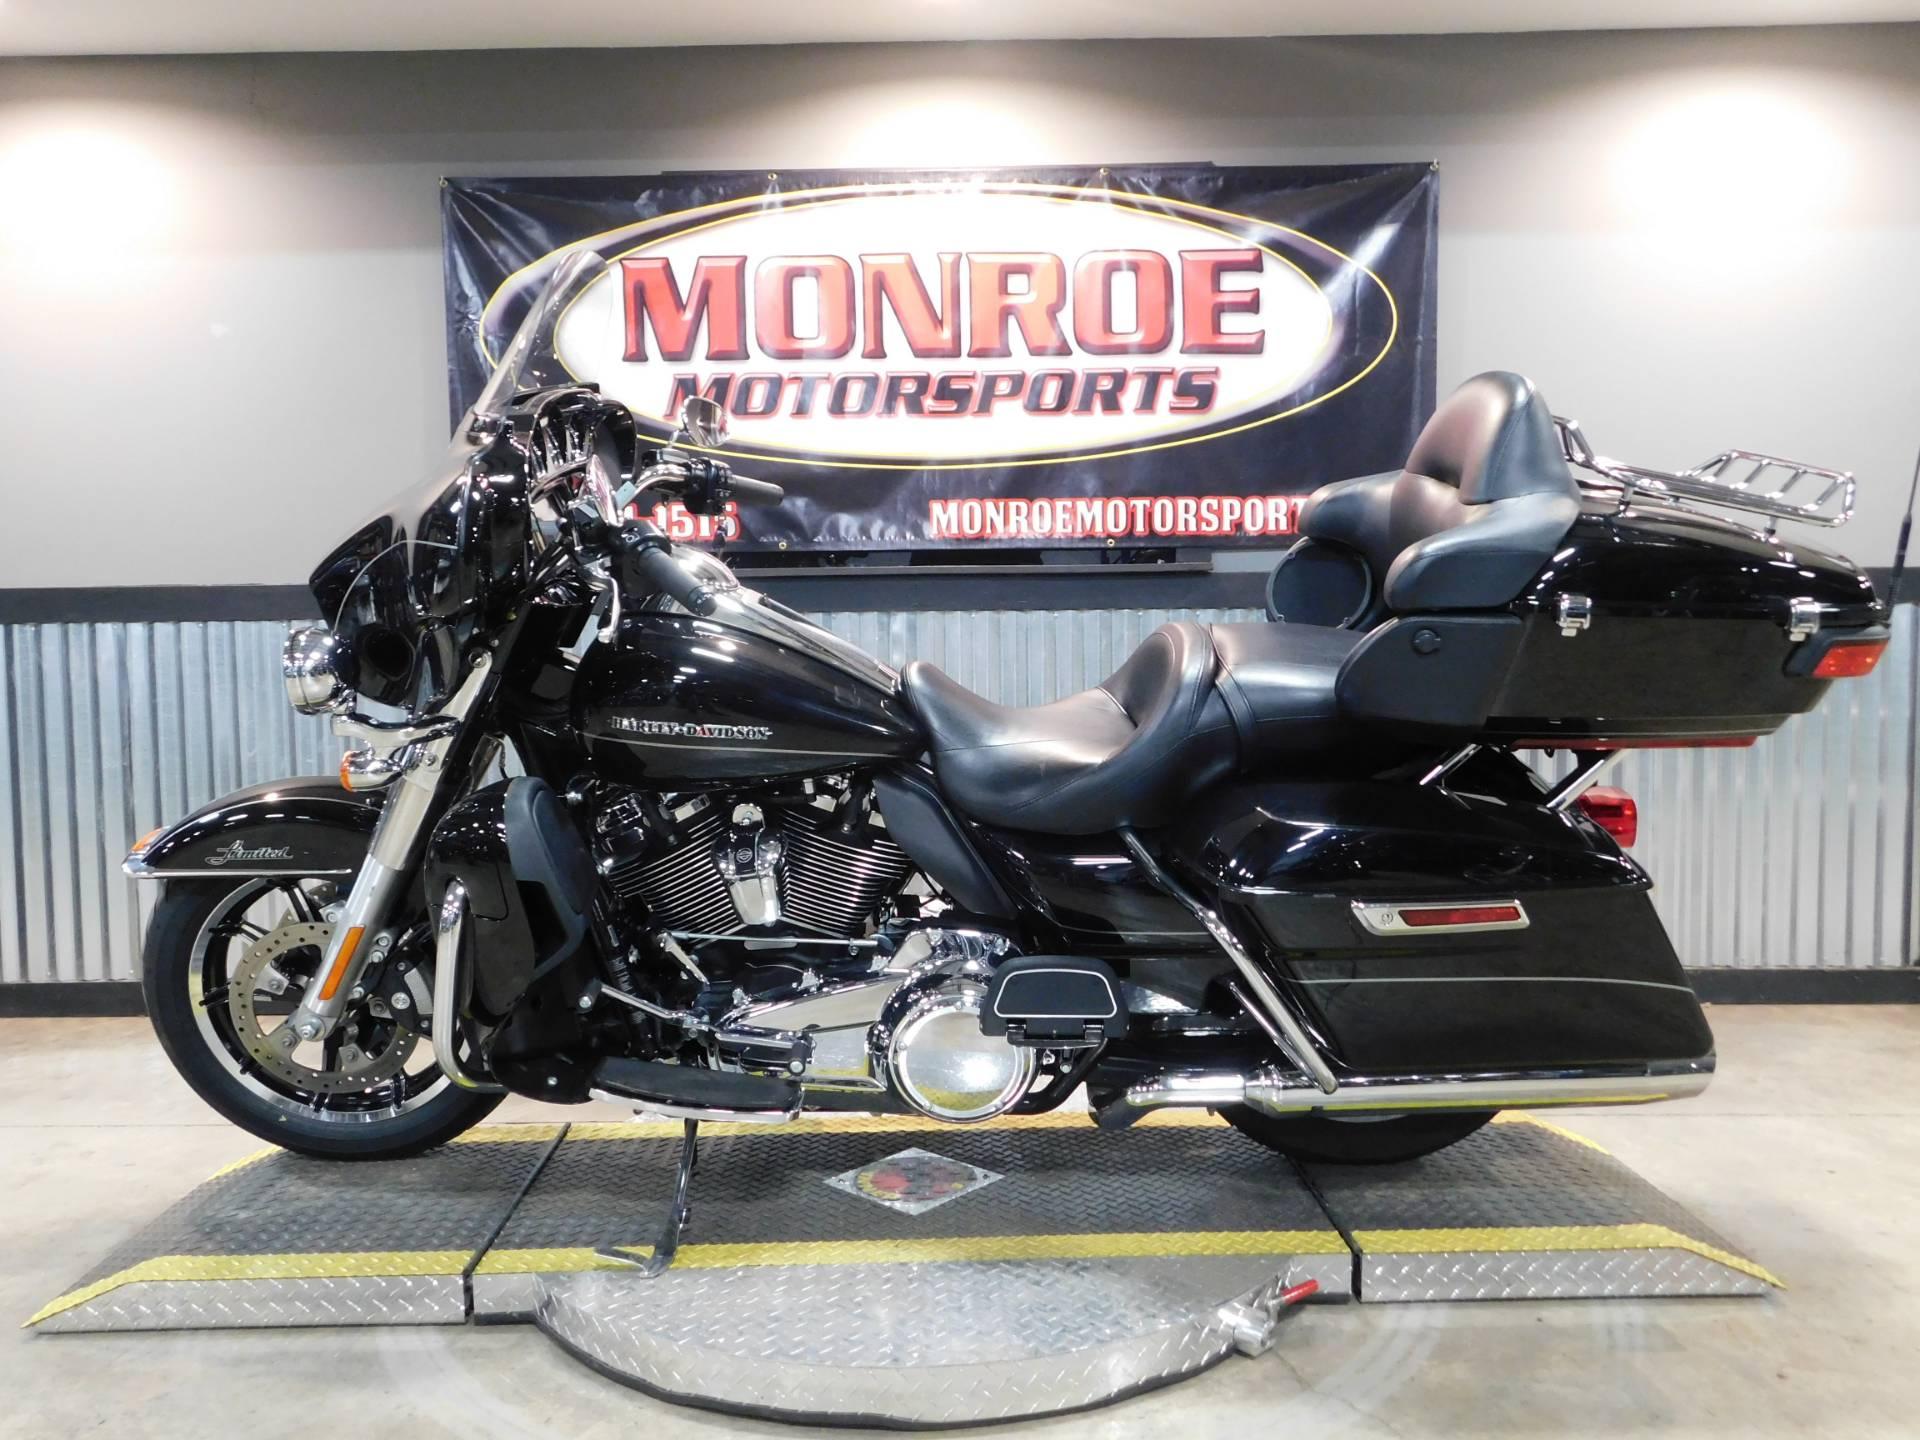 2017 Harley Davidson Ultra Limited In Monroe Michigan